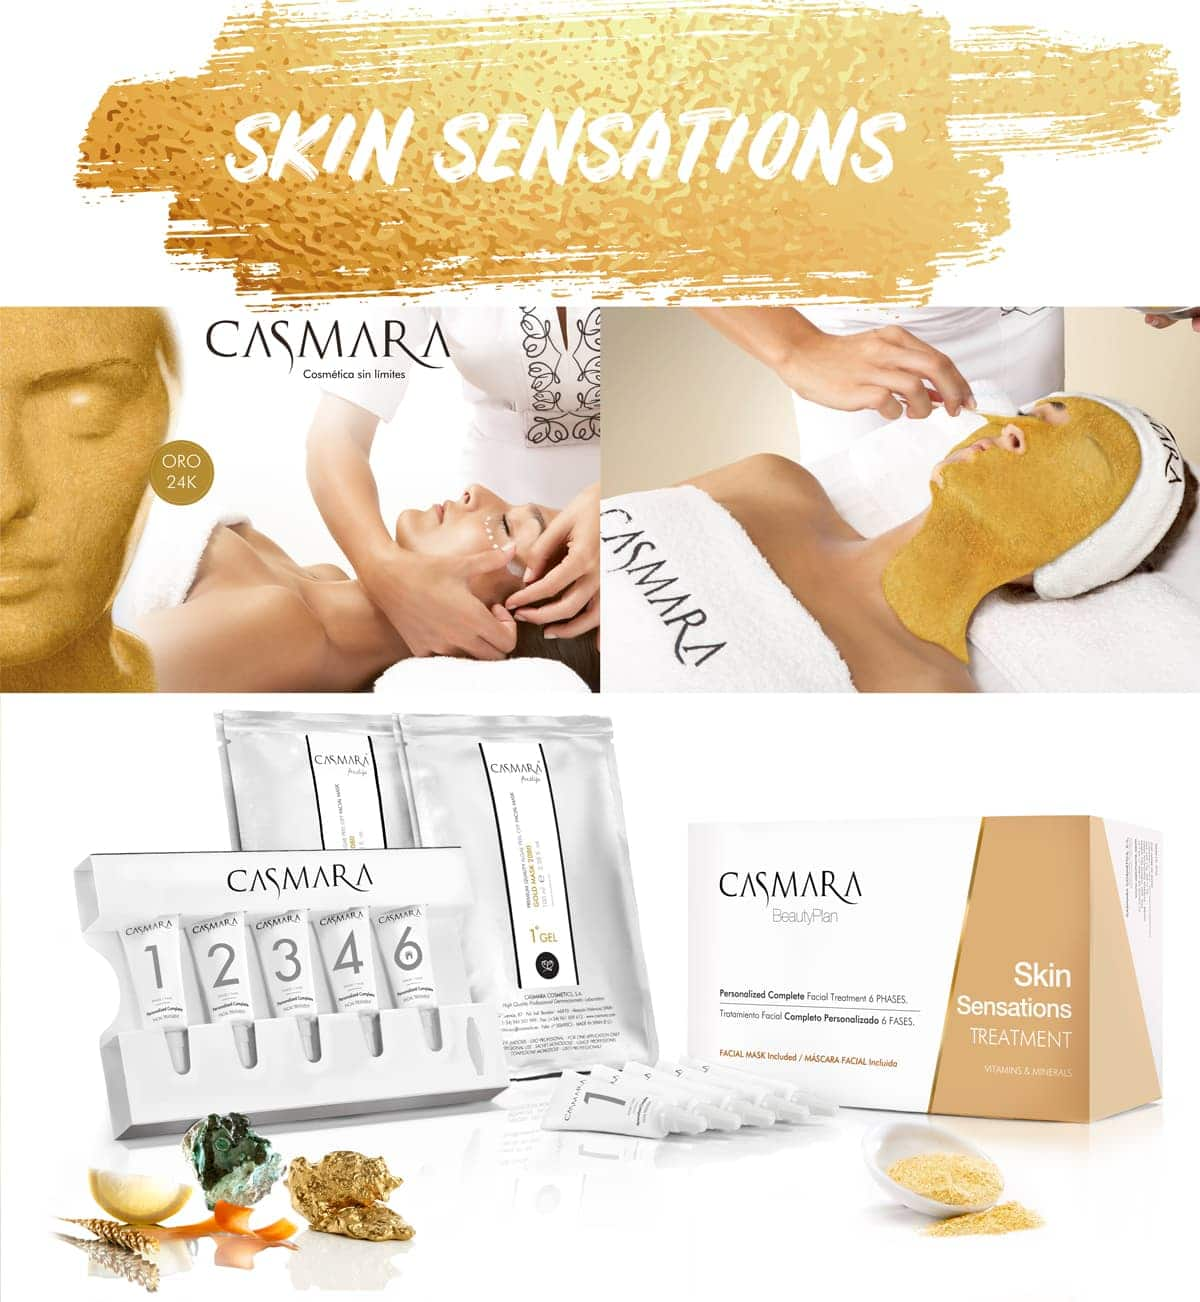 SKIN-SENSATIONS-TREATMENT-CASMARA-UK